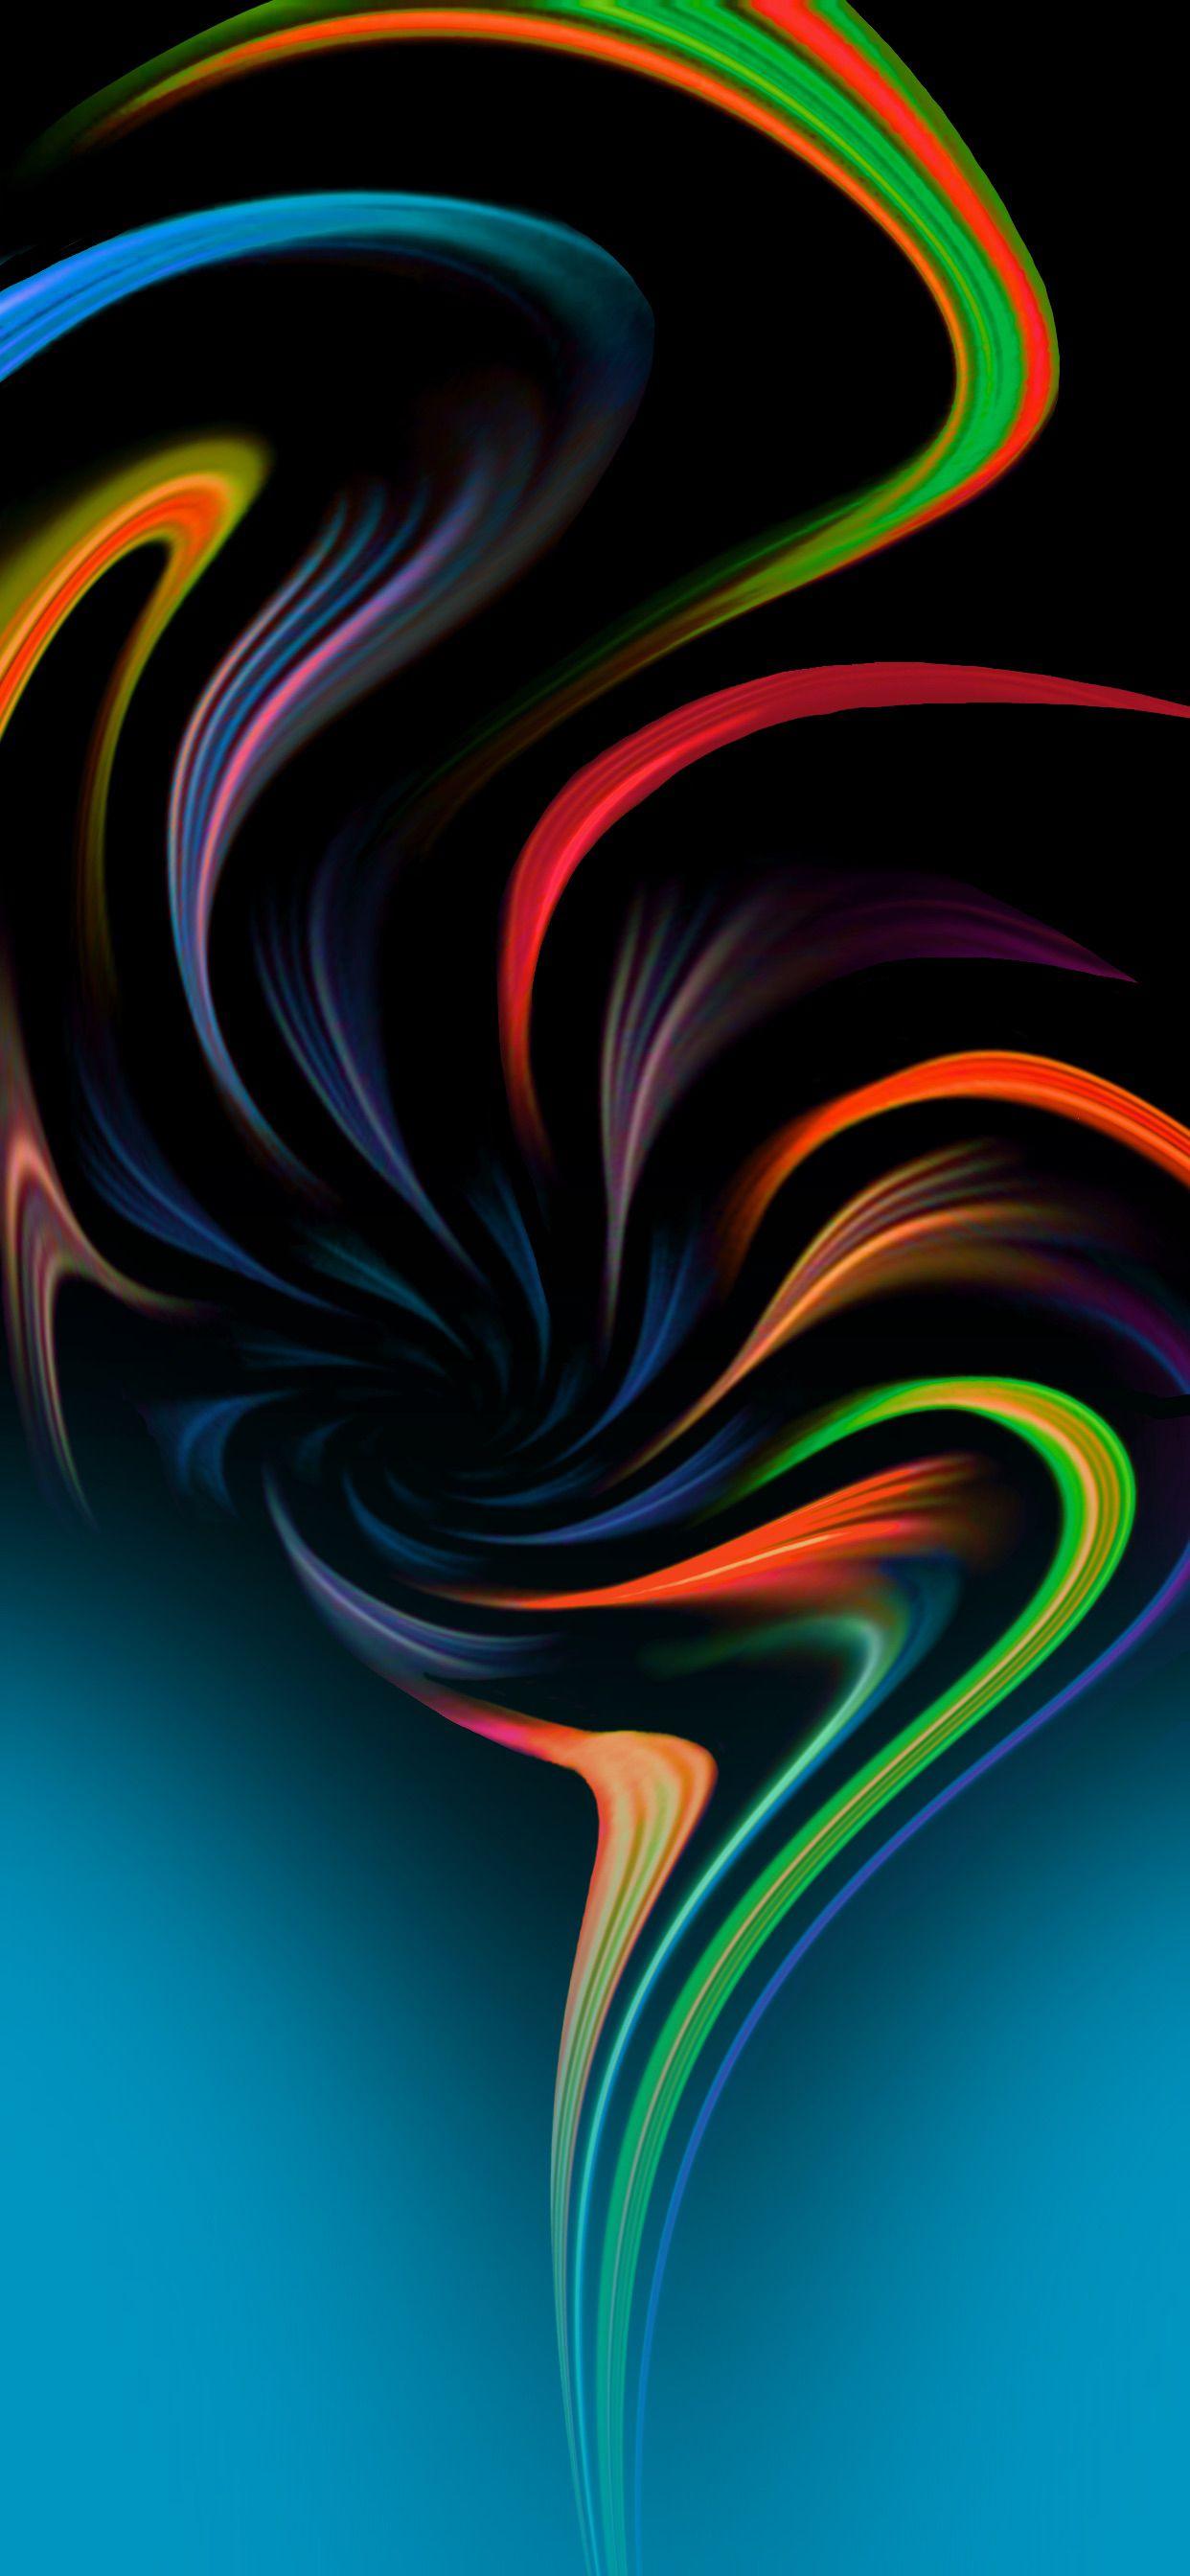 Abstract Wallpaper Designed By C Hotspot4u Abstract Wallpaper Design Iphone Wallpaper Graphic Wallpaper